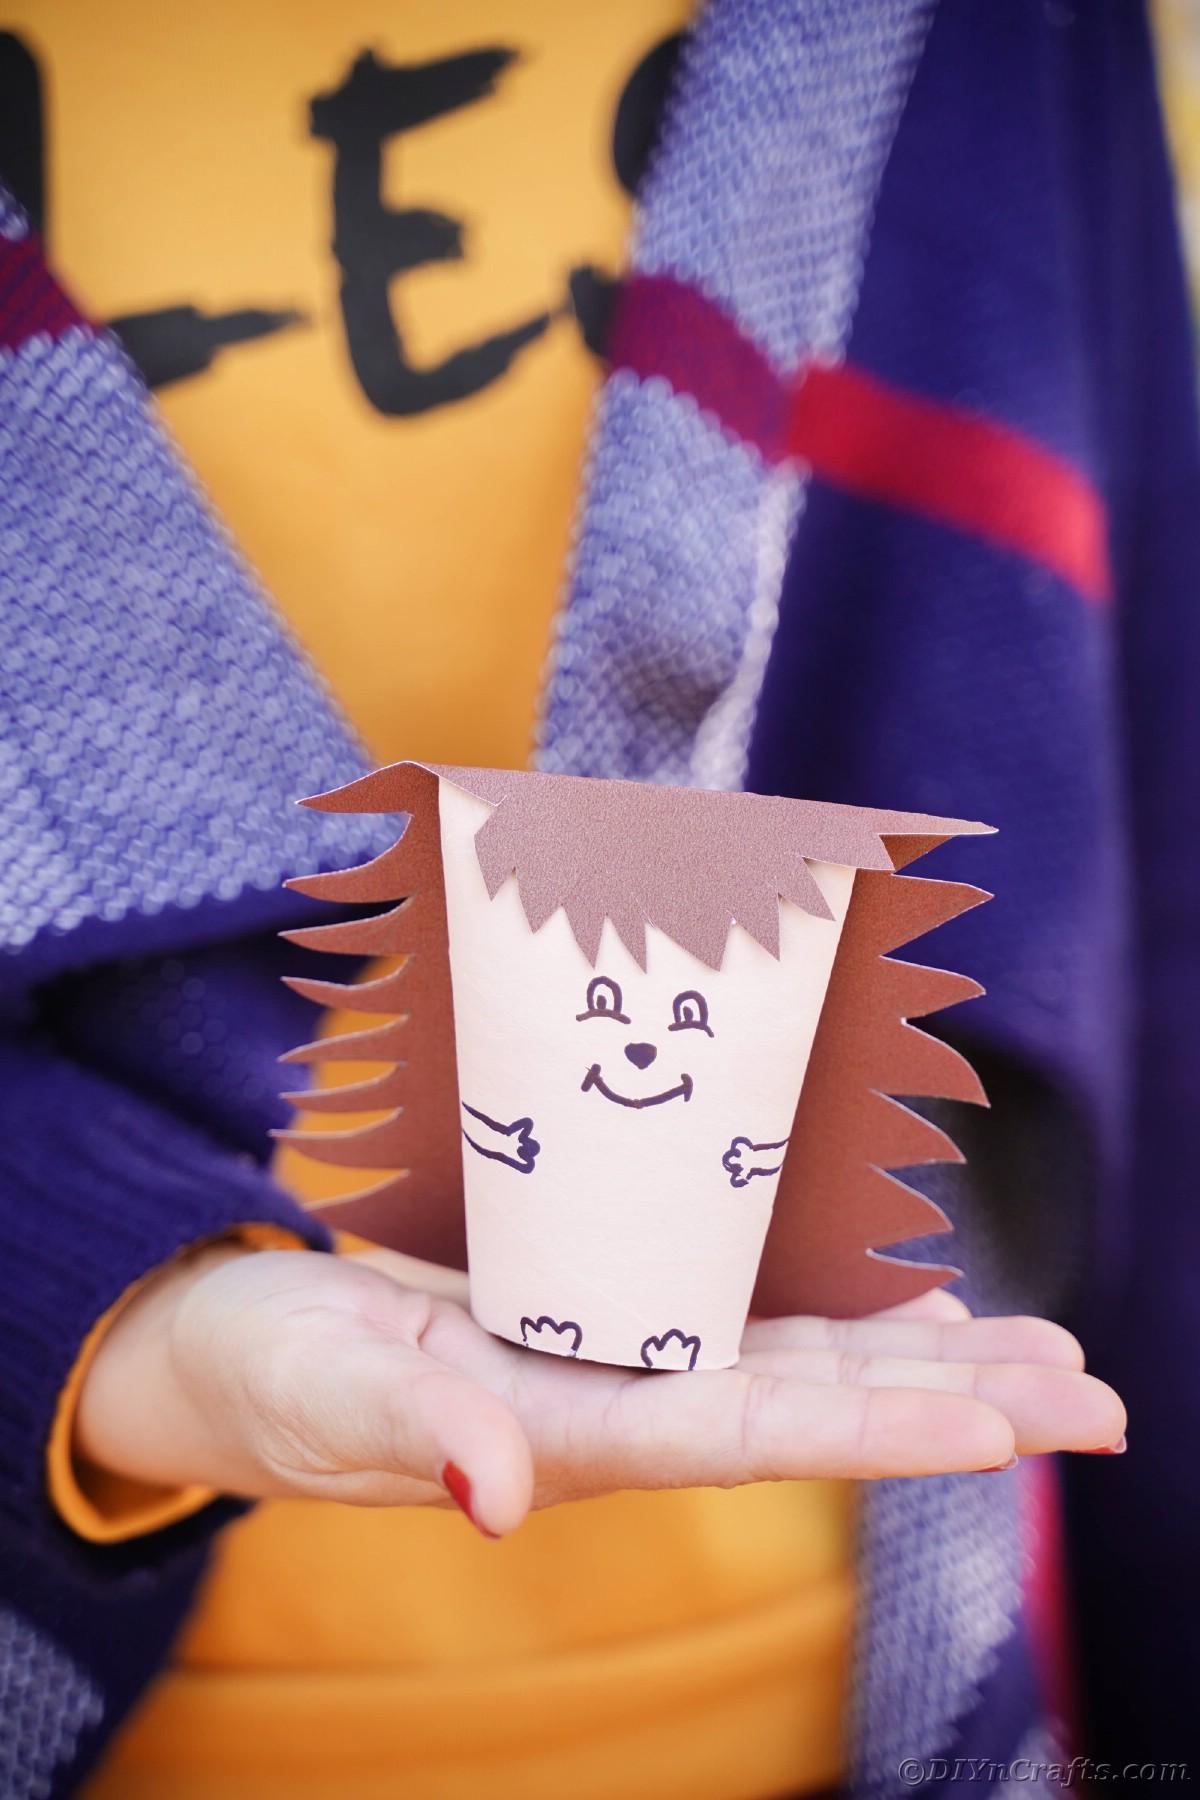 Woman in orange shirt holding toilet paper roll hedgehog